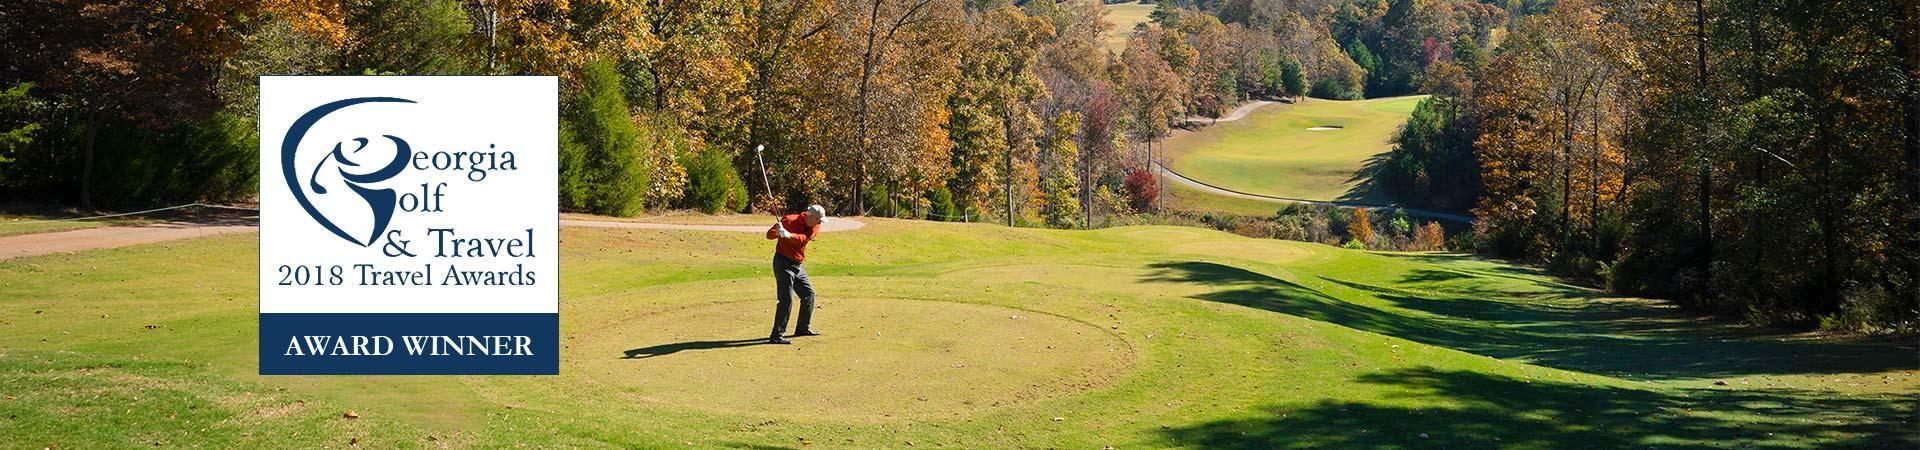 Golfing at Georgia State Parks